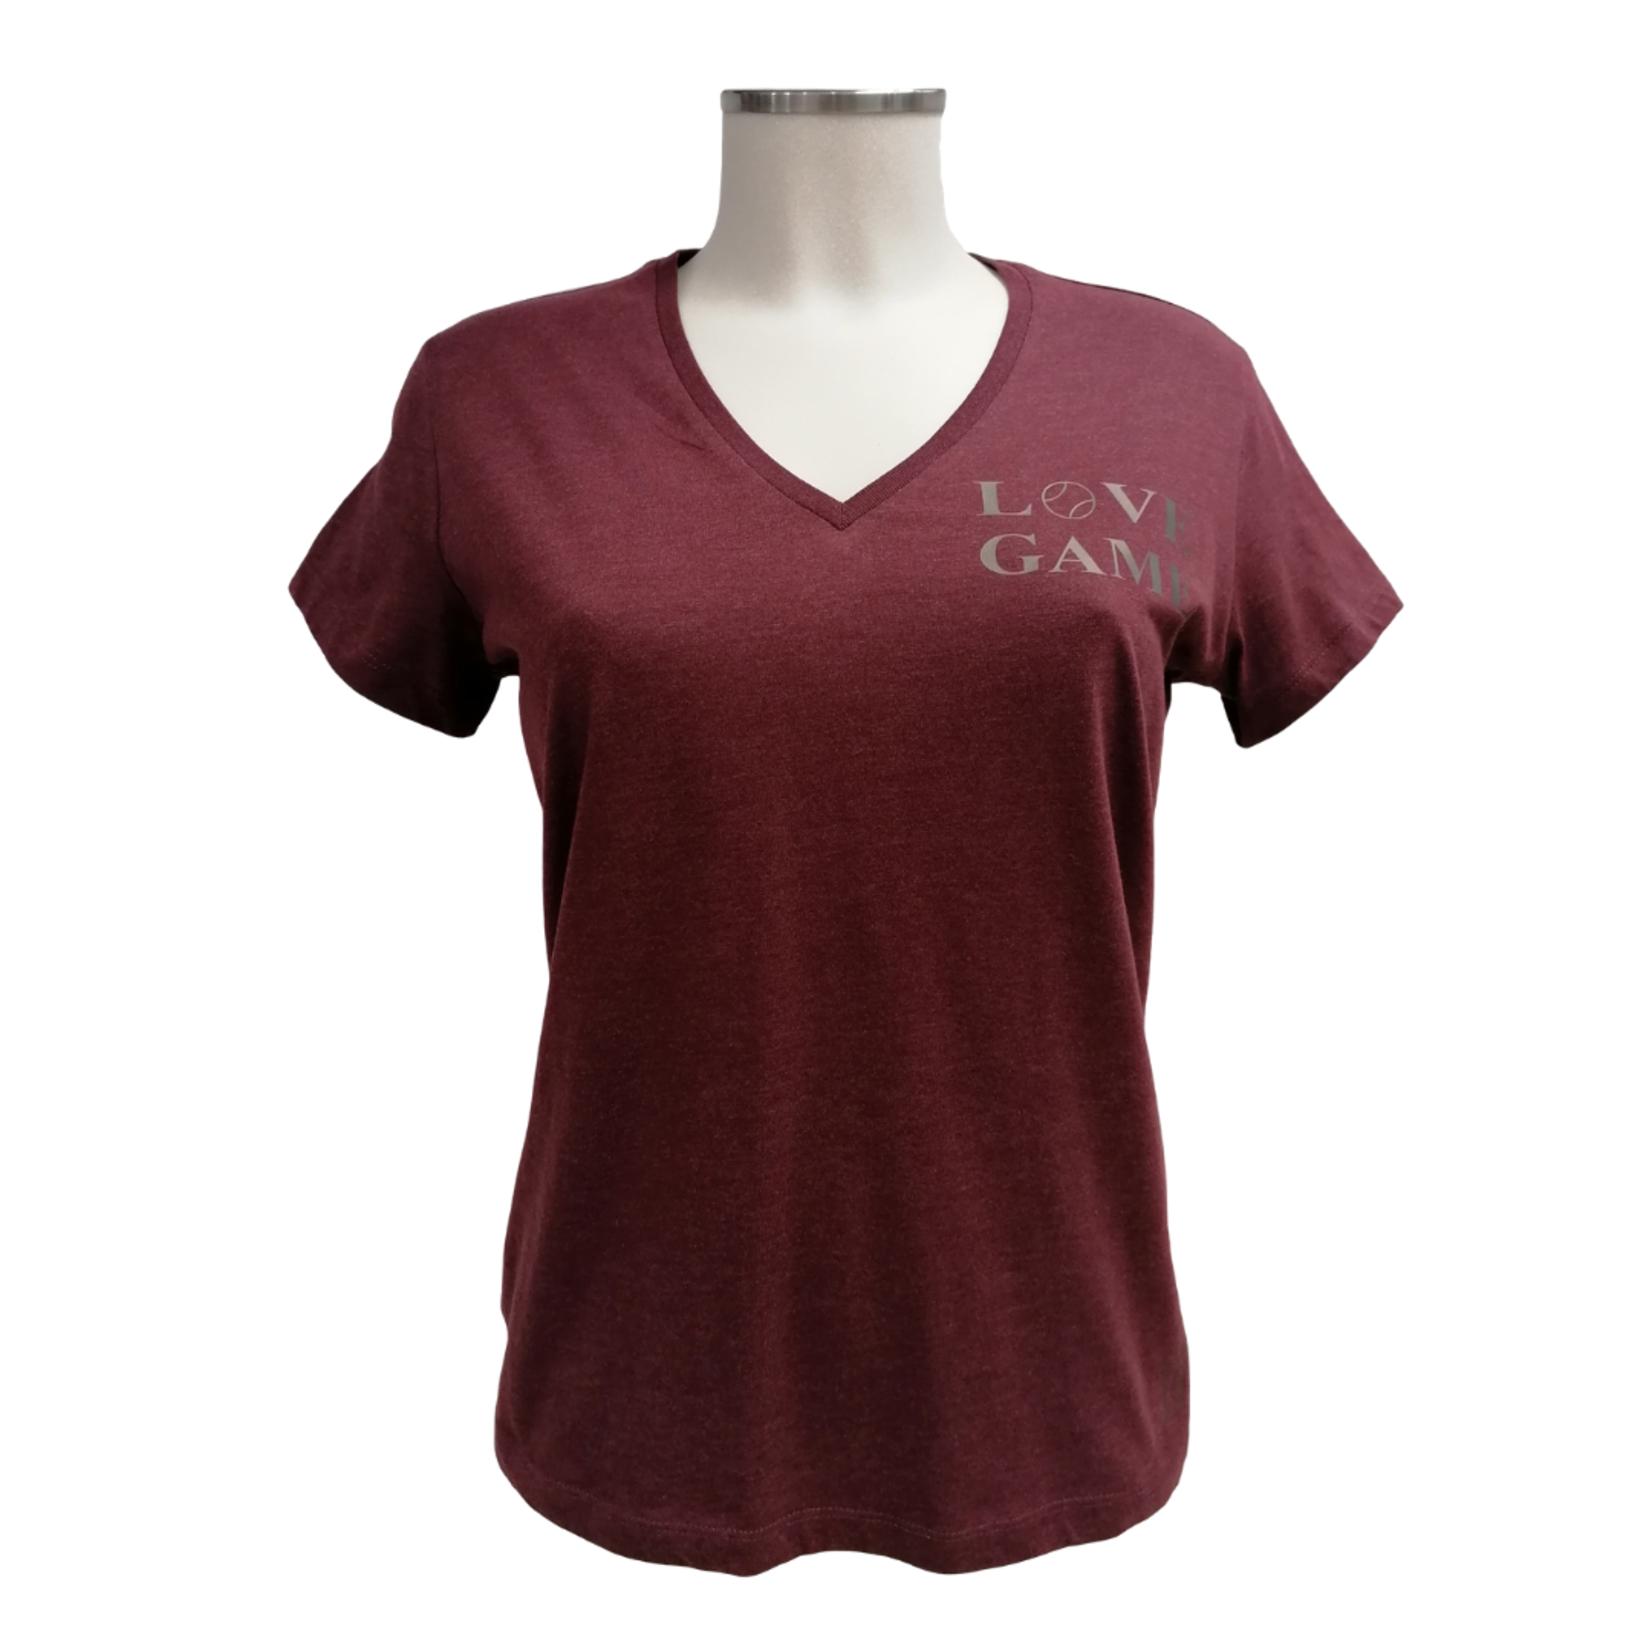 Verloy Dames Organic Cotton V-Neck Love Game T-shirt